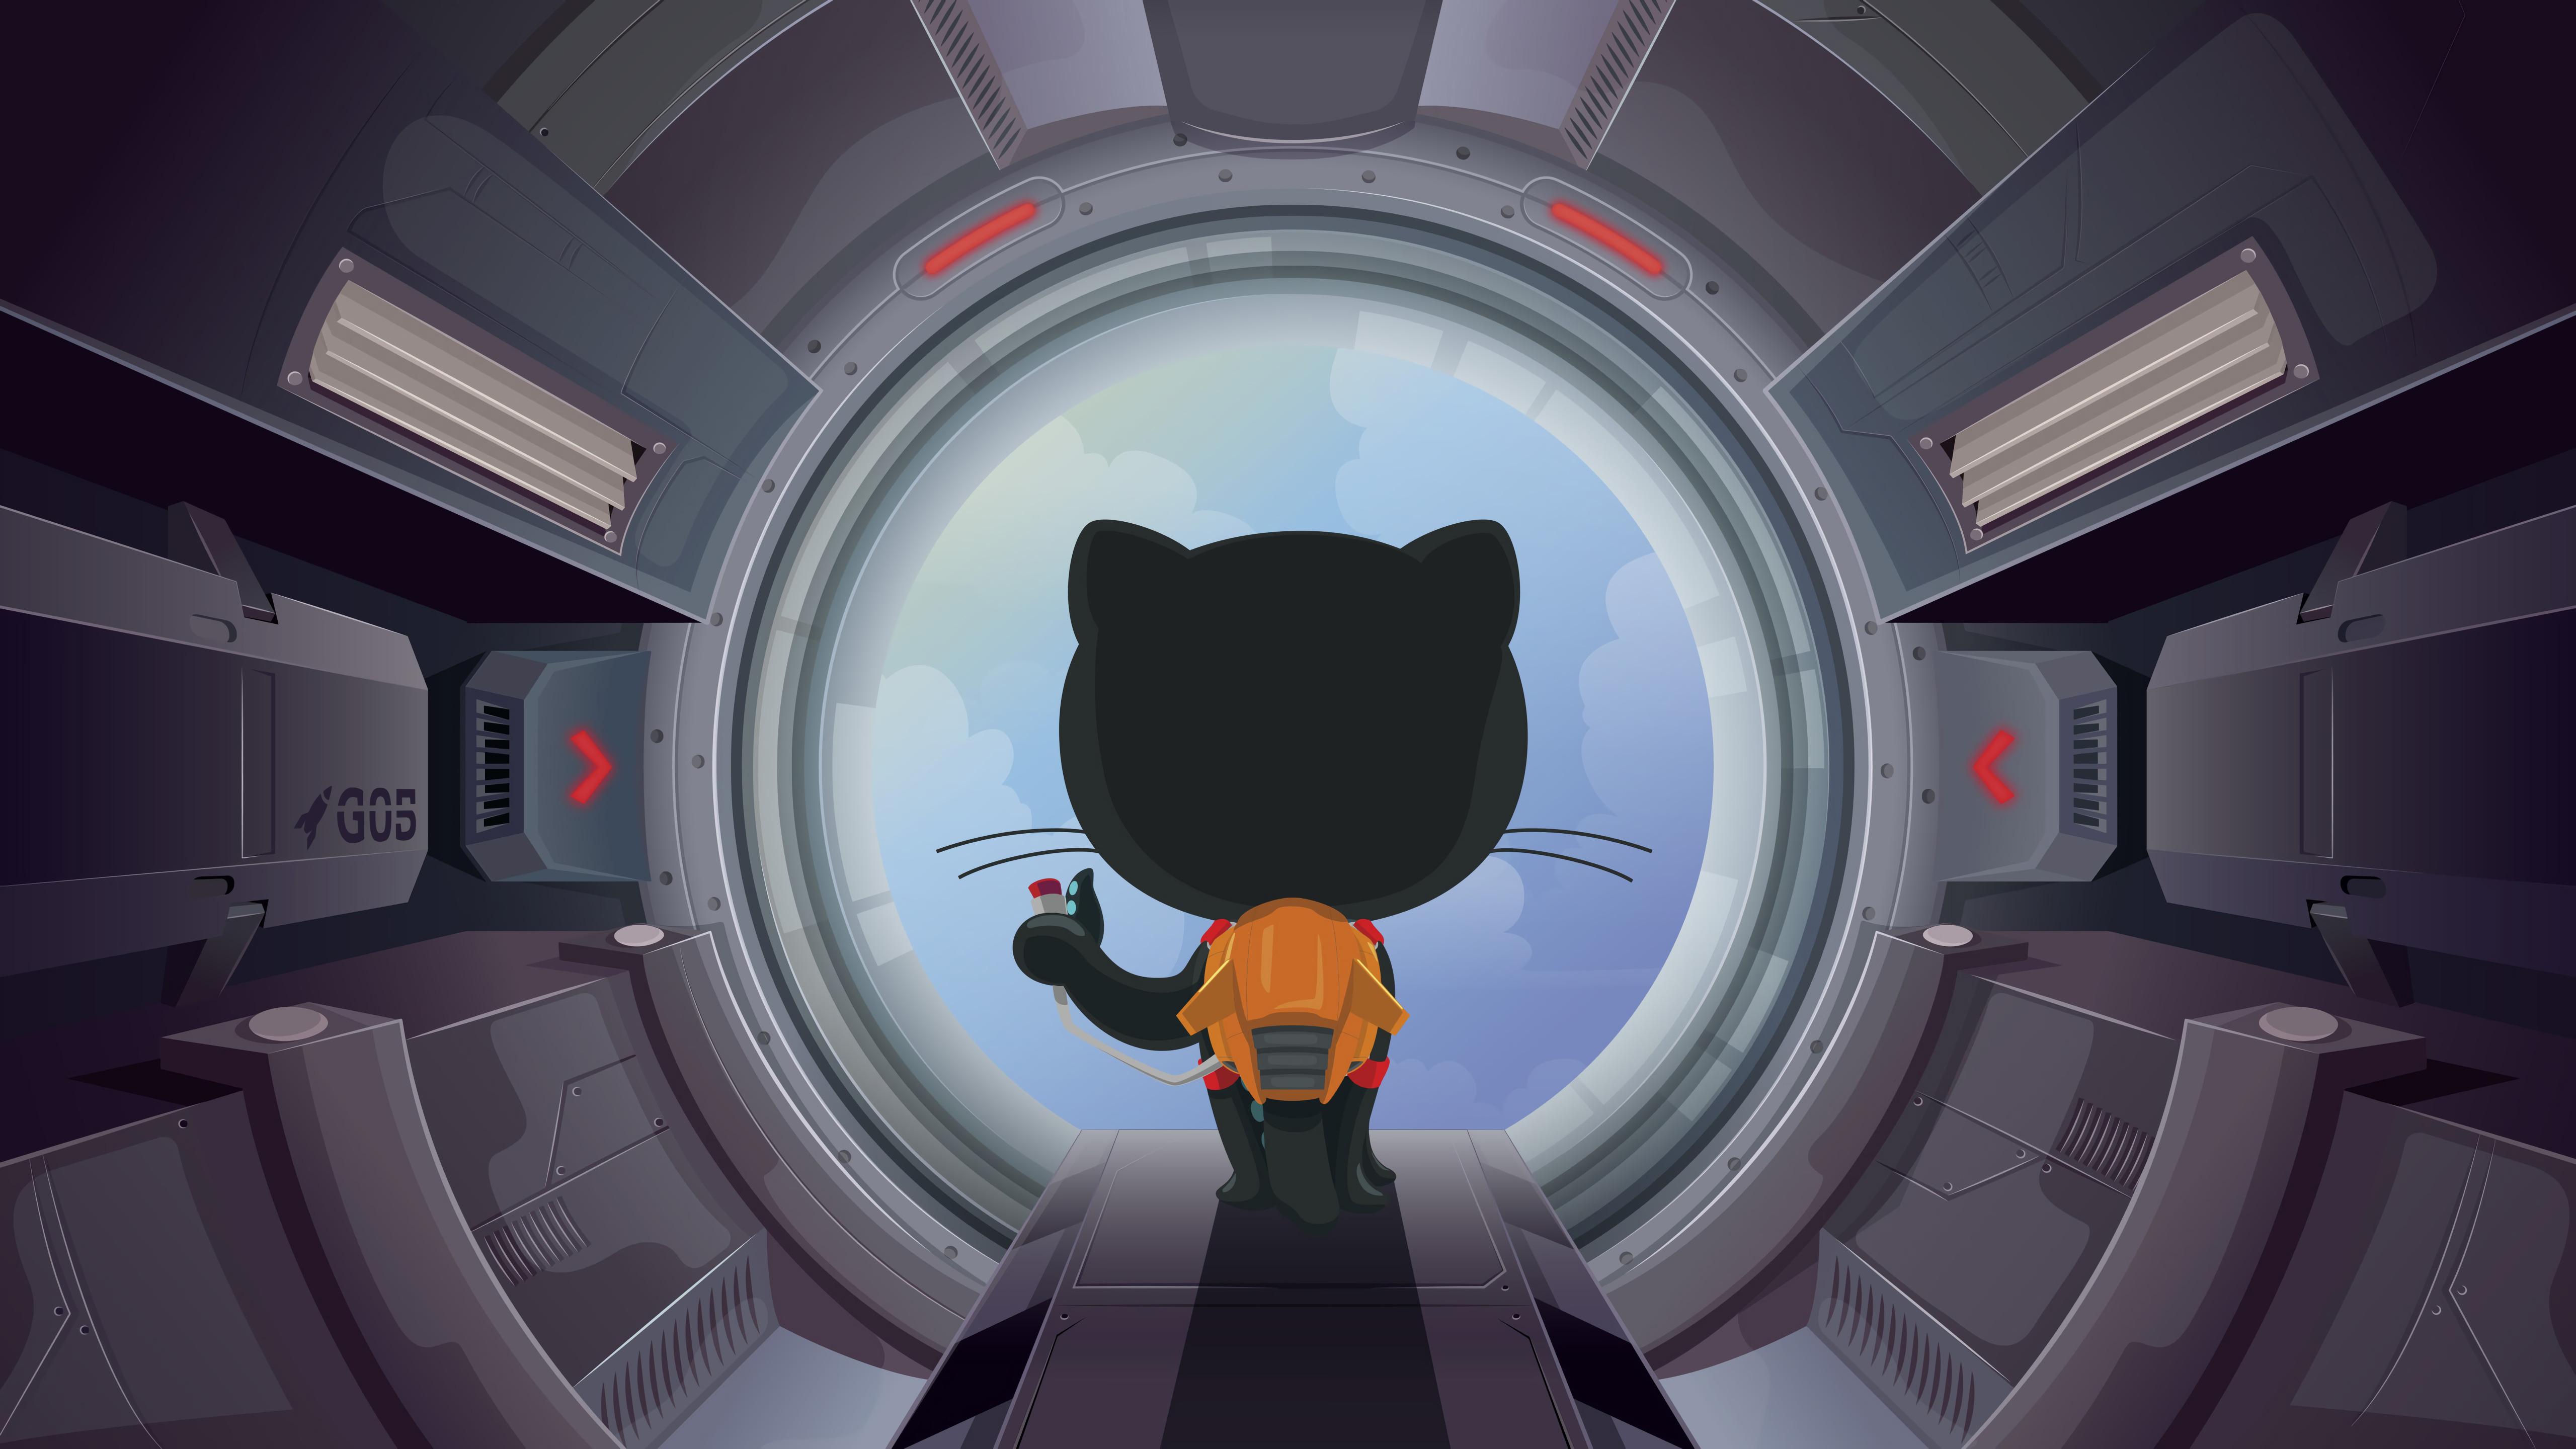 General 5120x2880 github cats artwork science fiction Octocat cyberpunk 4K